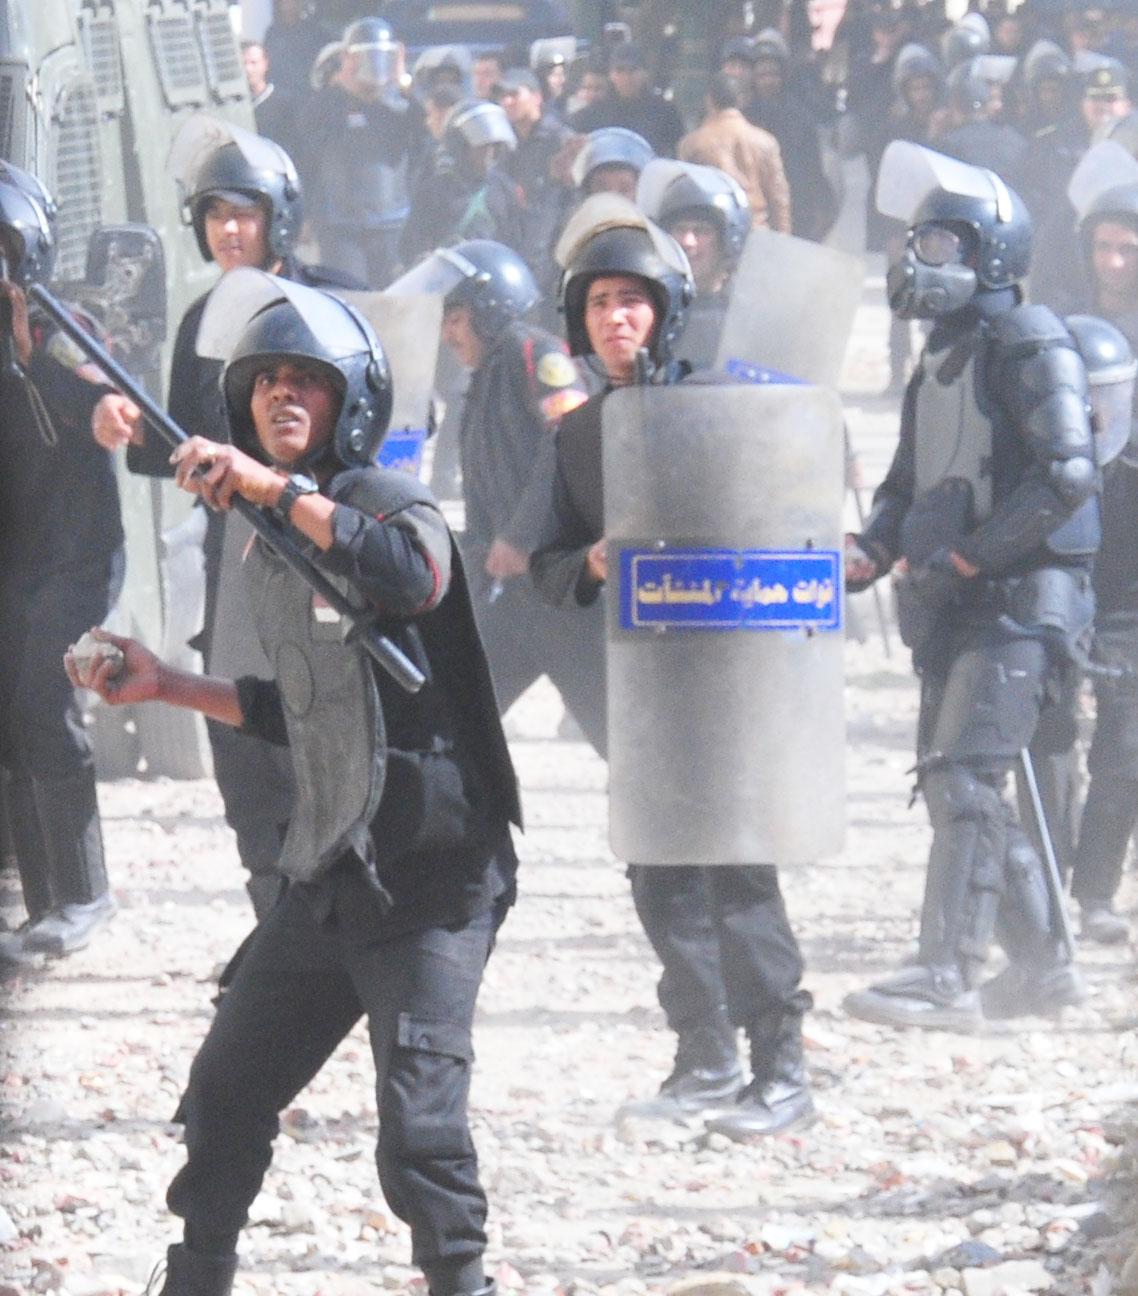 Protester clash with central security forces on Qasr El-Aini Street on 26 January. (DNE/ Ahmad El-Melky)